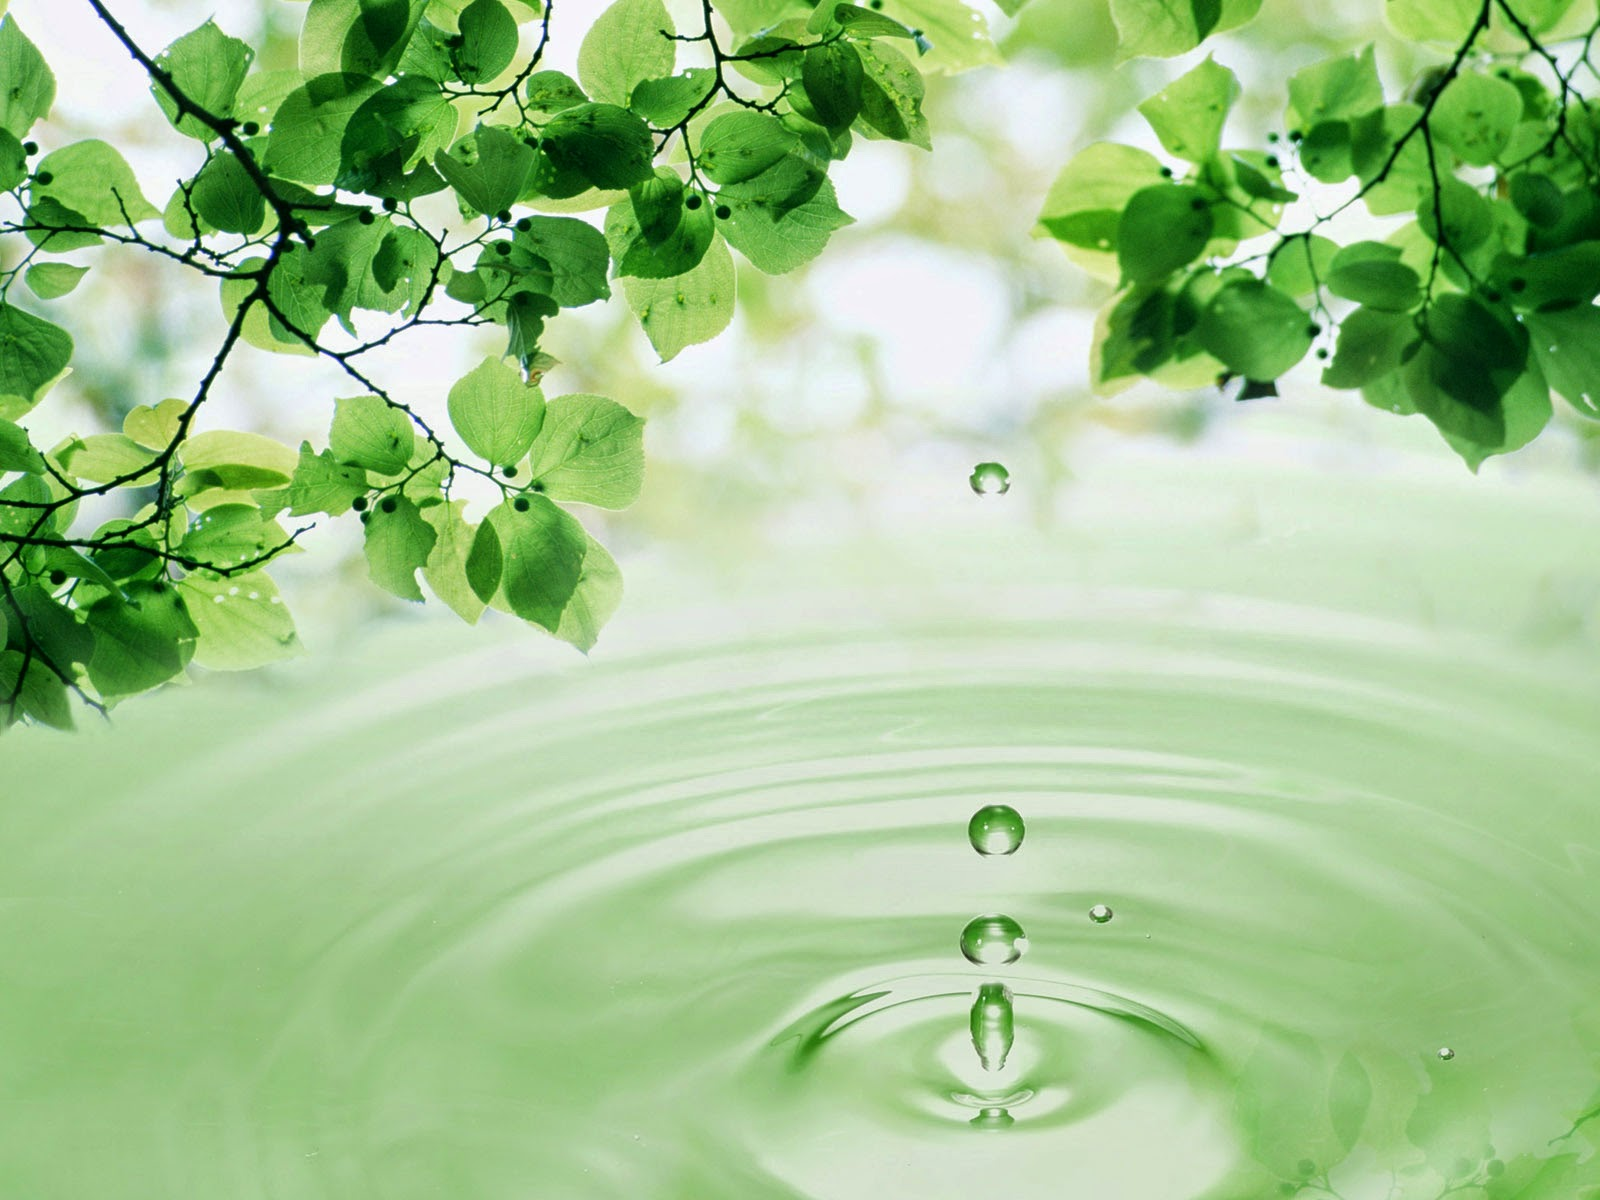 Water Drio Widescreen